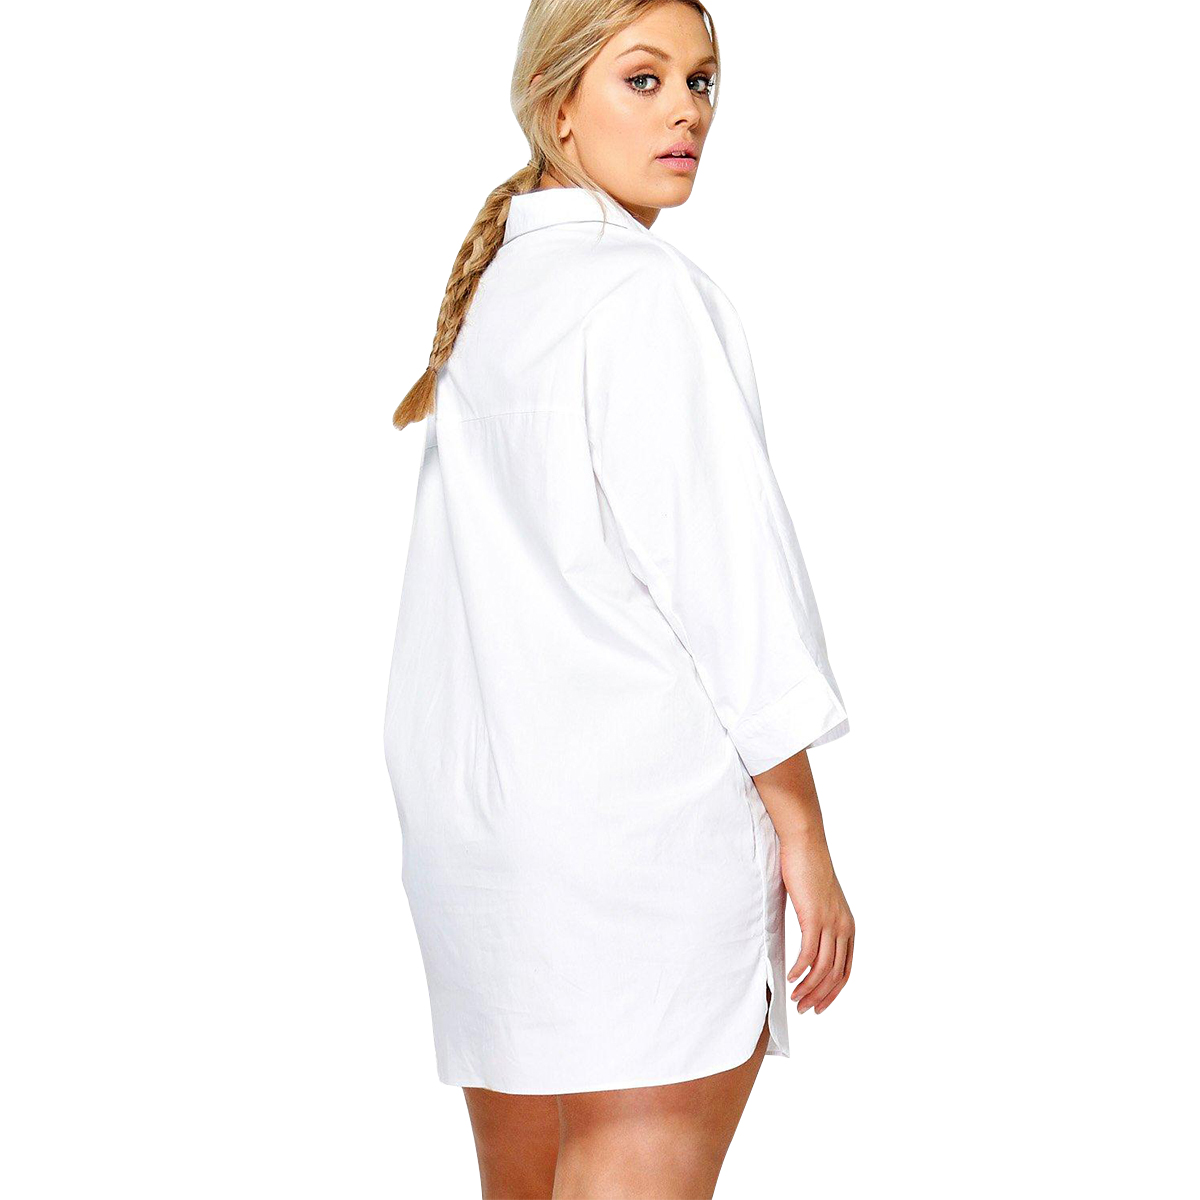 Kissmilk Women Plus Size Foral Embroidery Turn Down Collar Shirt Nine Quarter Sleeve Solid Basic Shirt Large Size Casual Shirt 1